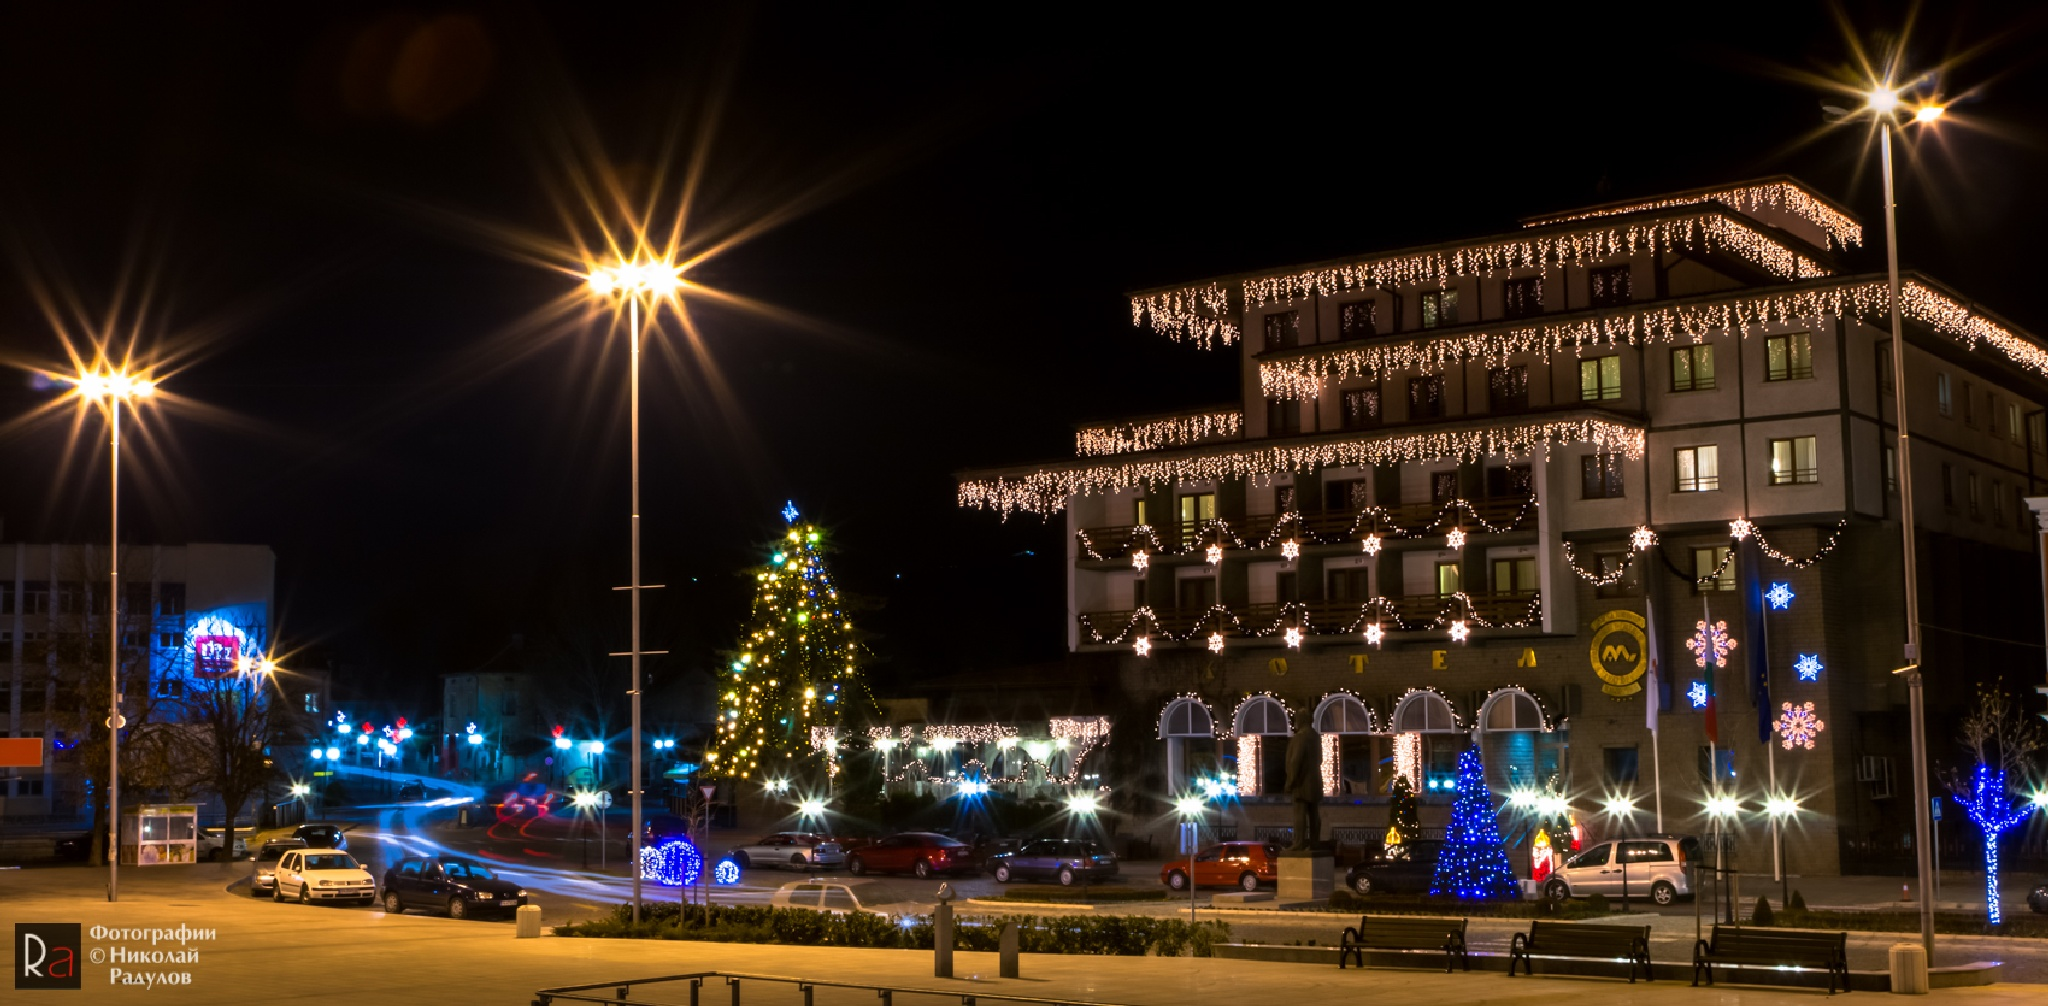 Christmas lights by Nikolay Radulov